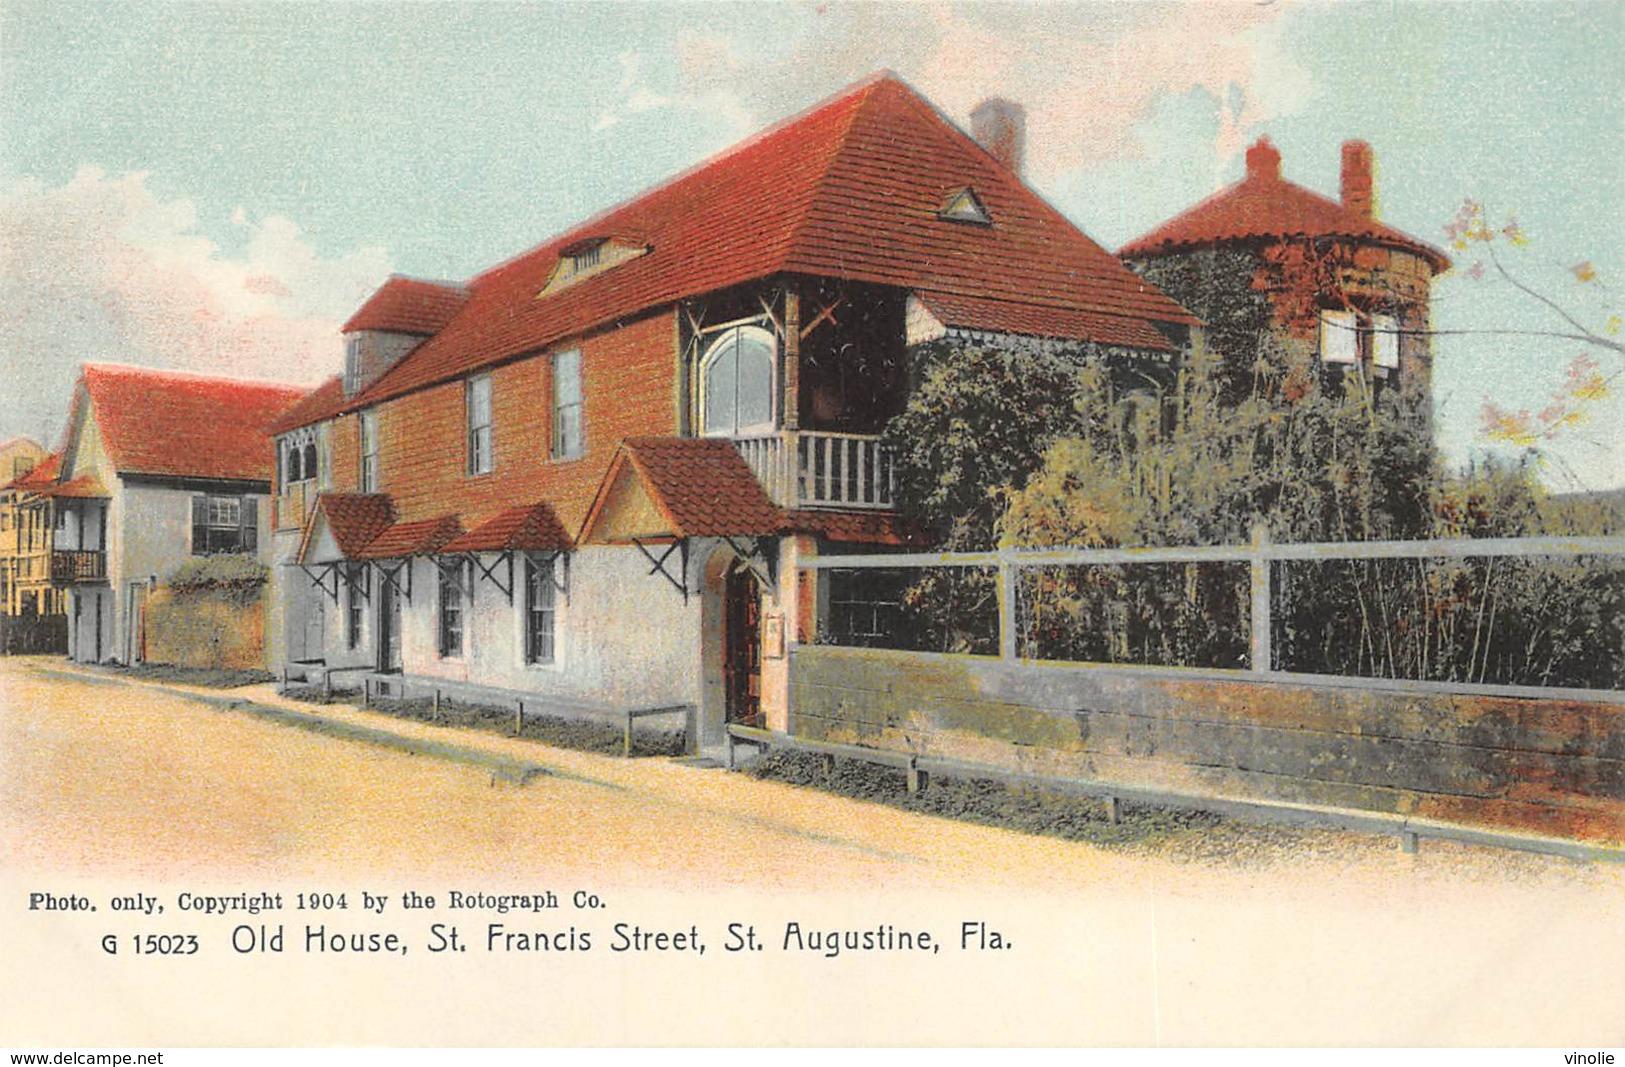 A-19-2517 : SAINT AUGUSTINE.  OLD HOUSE. SAINT FRANCIS STREET. - St Augustine